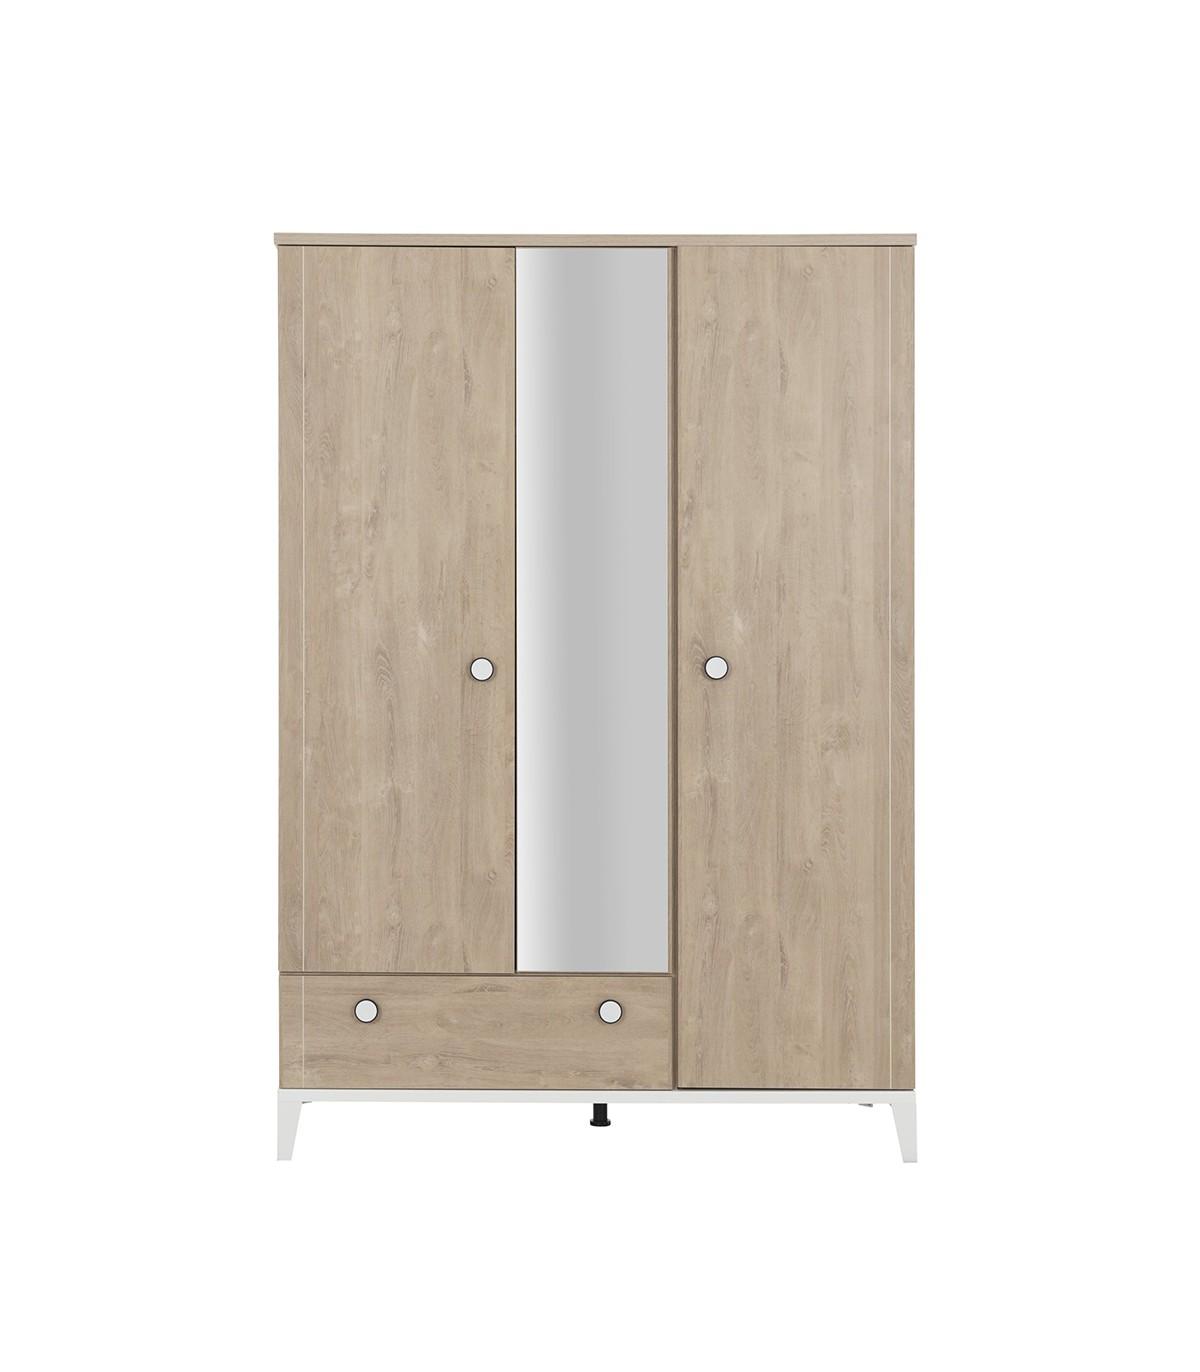 Armoire 3 portes 1 tiroir avec miroir - Marron